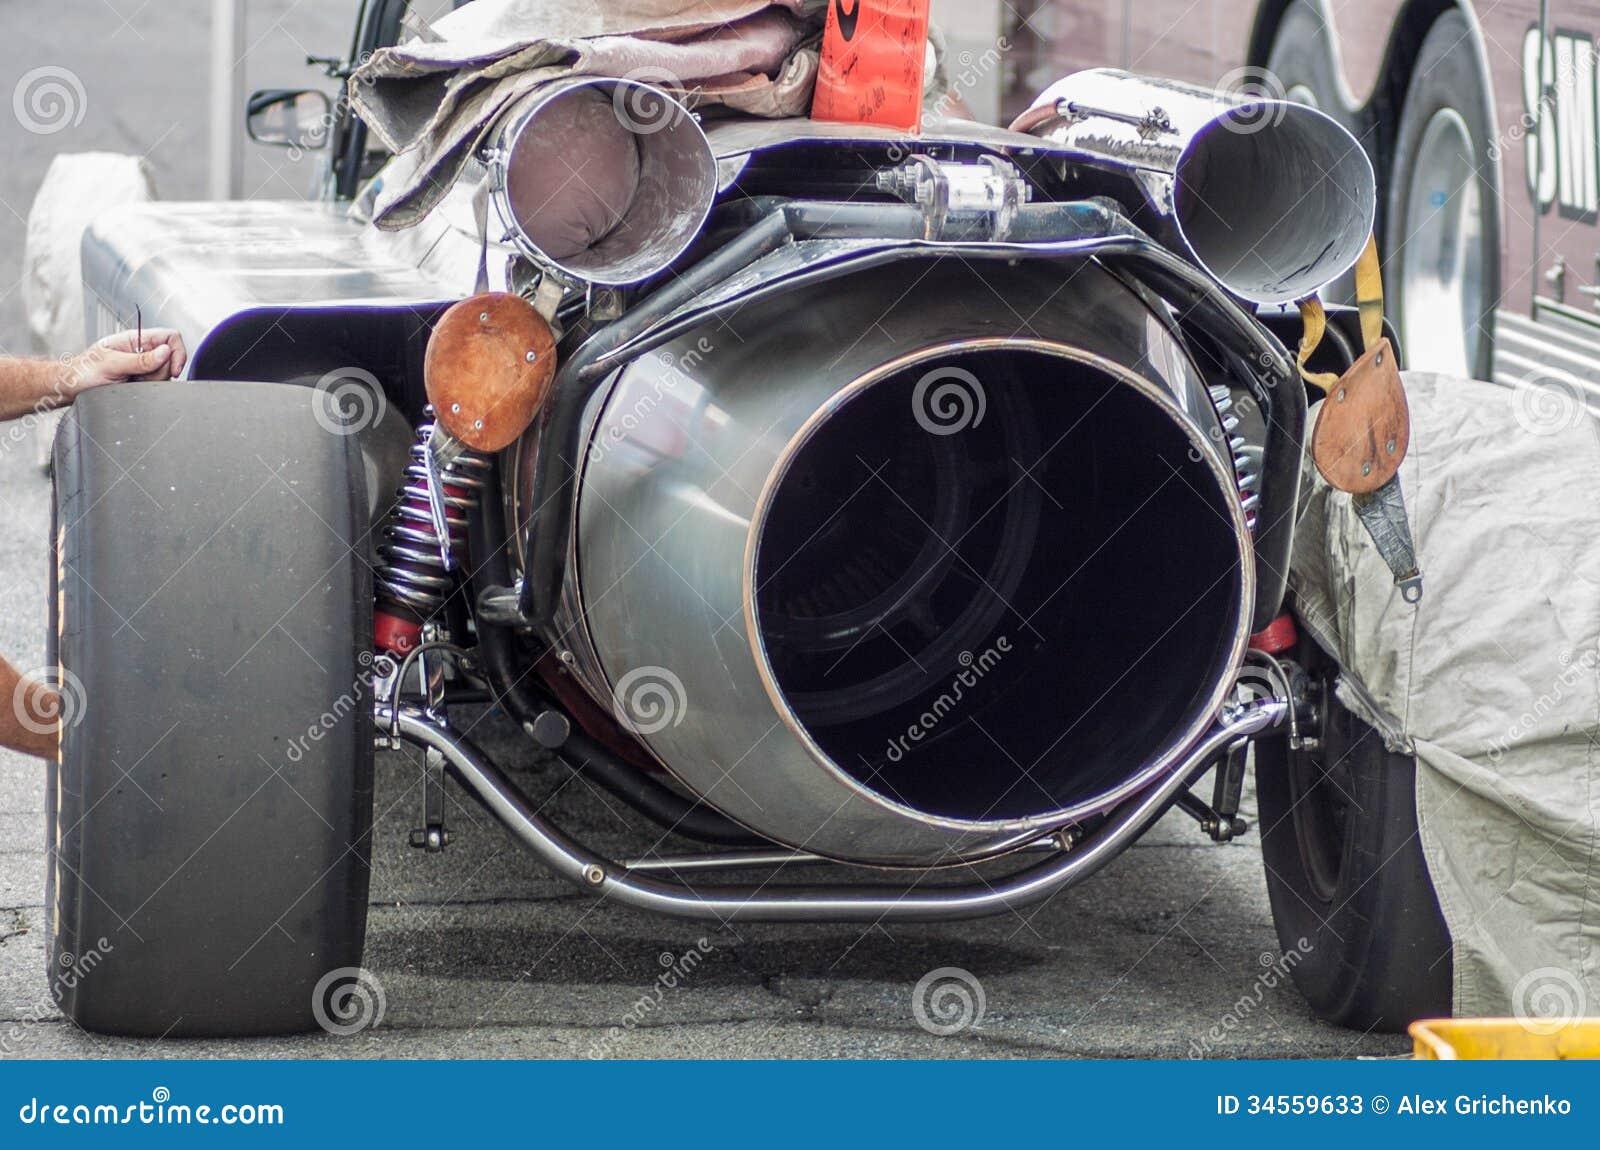 mechanica working on a jet engine